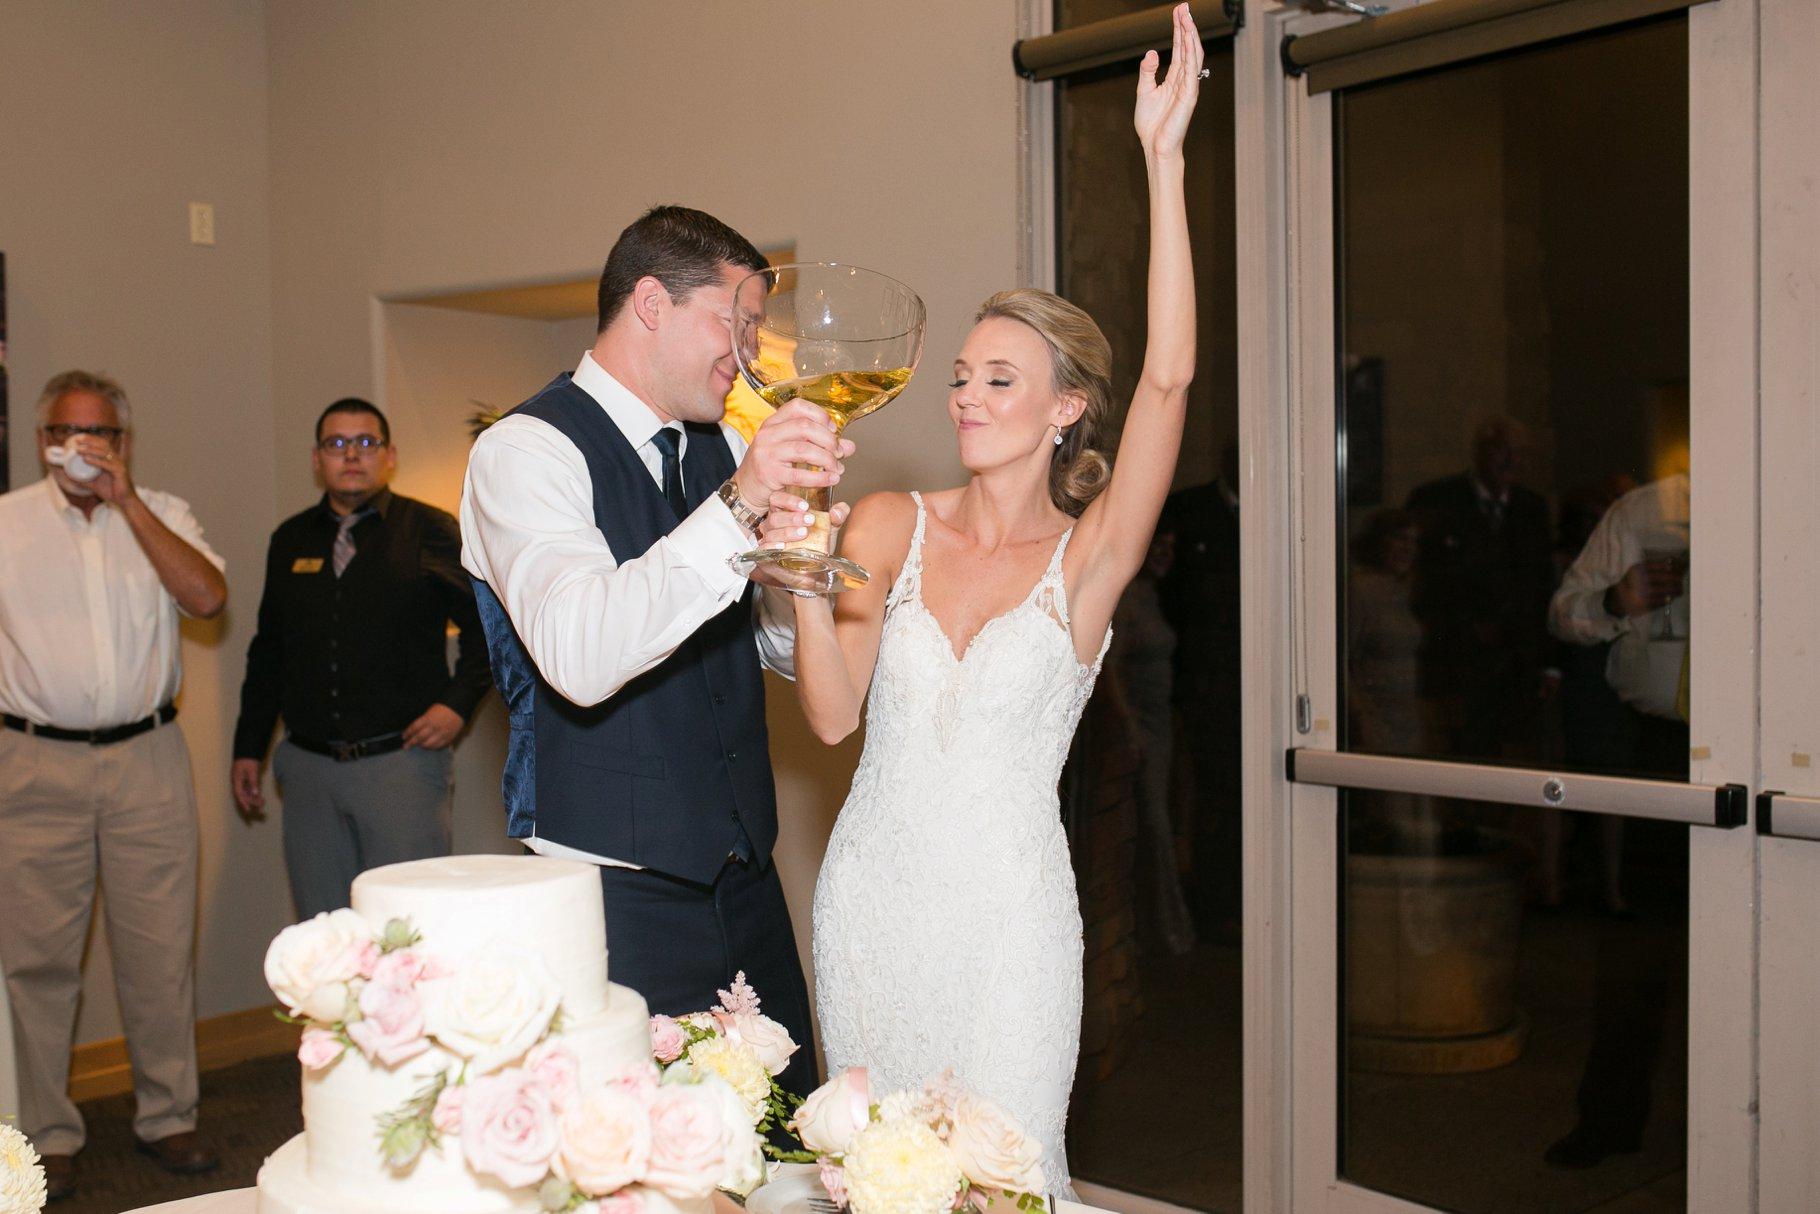 sedona wedding-526_GRETCHEN WAKEMAN PHOTOGRAPHY.jpg